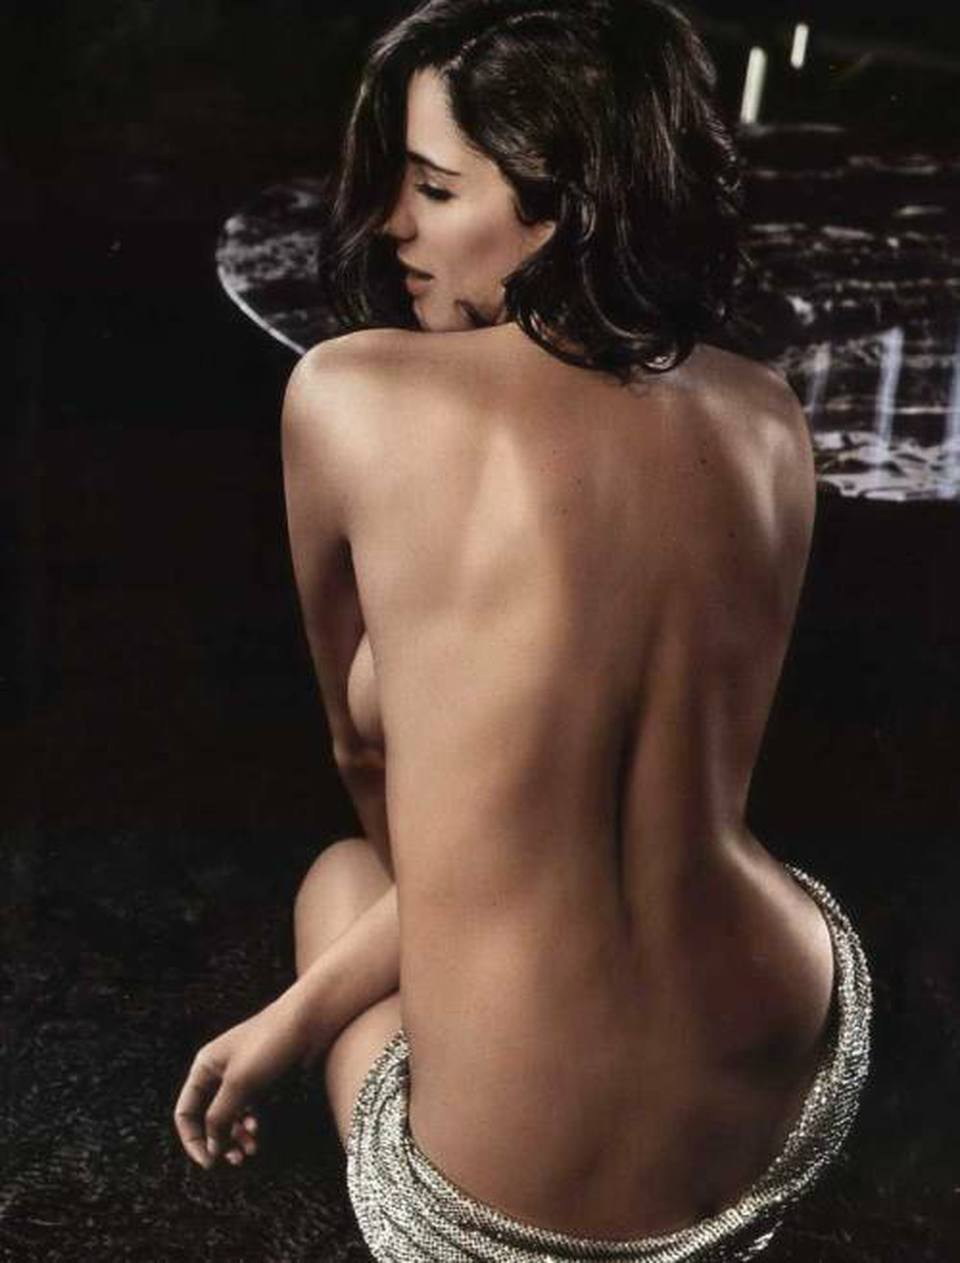 anna popplewell sex free video